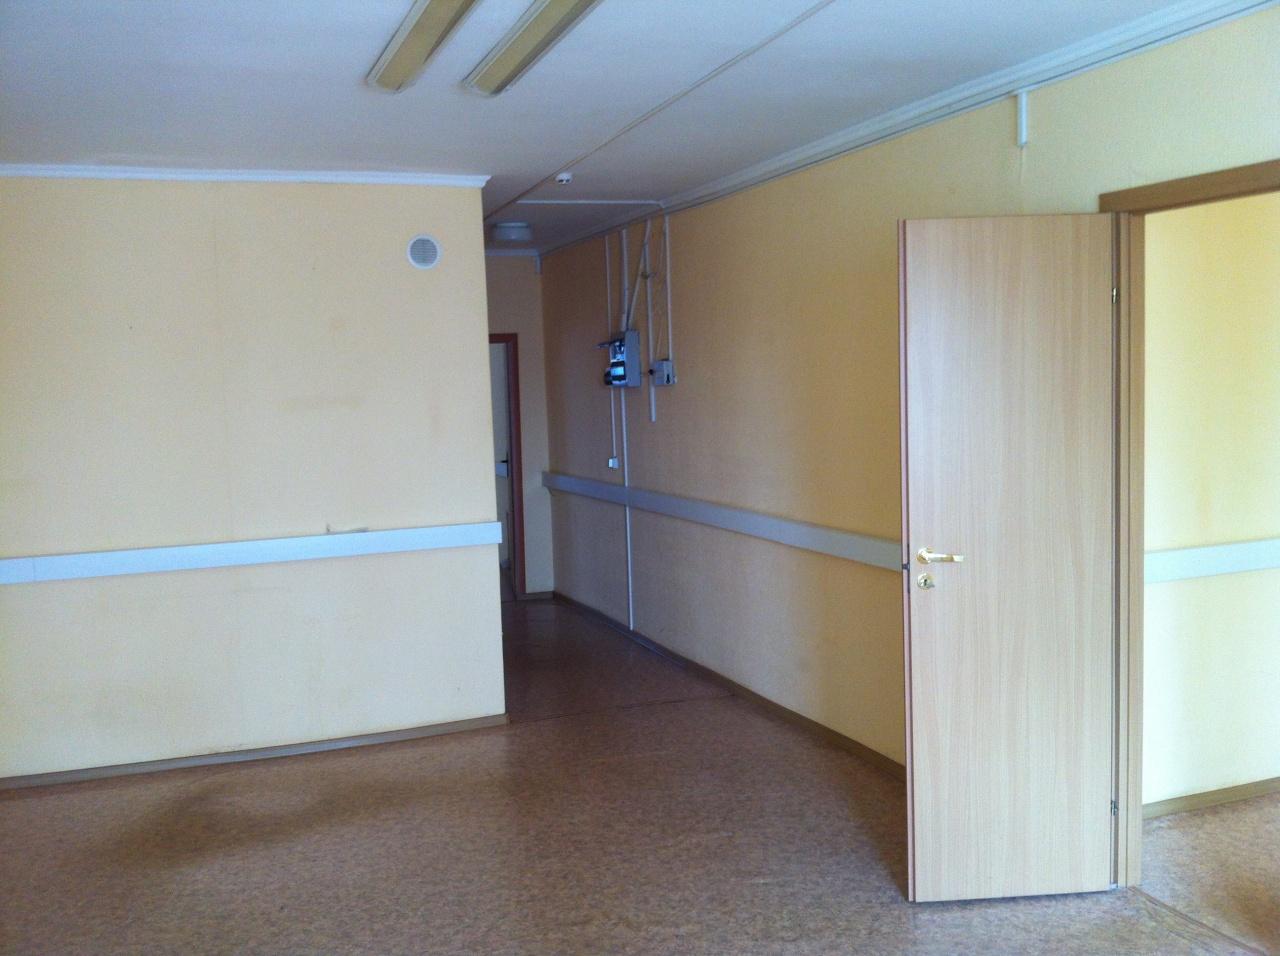 Аренда офиса, помещения под офис ул. Фрунзе, 8